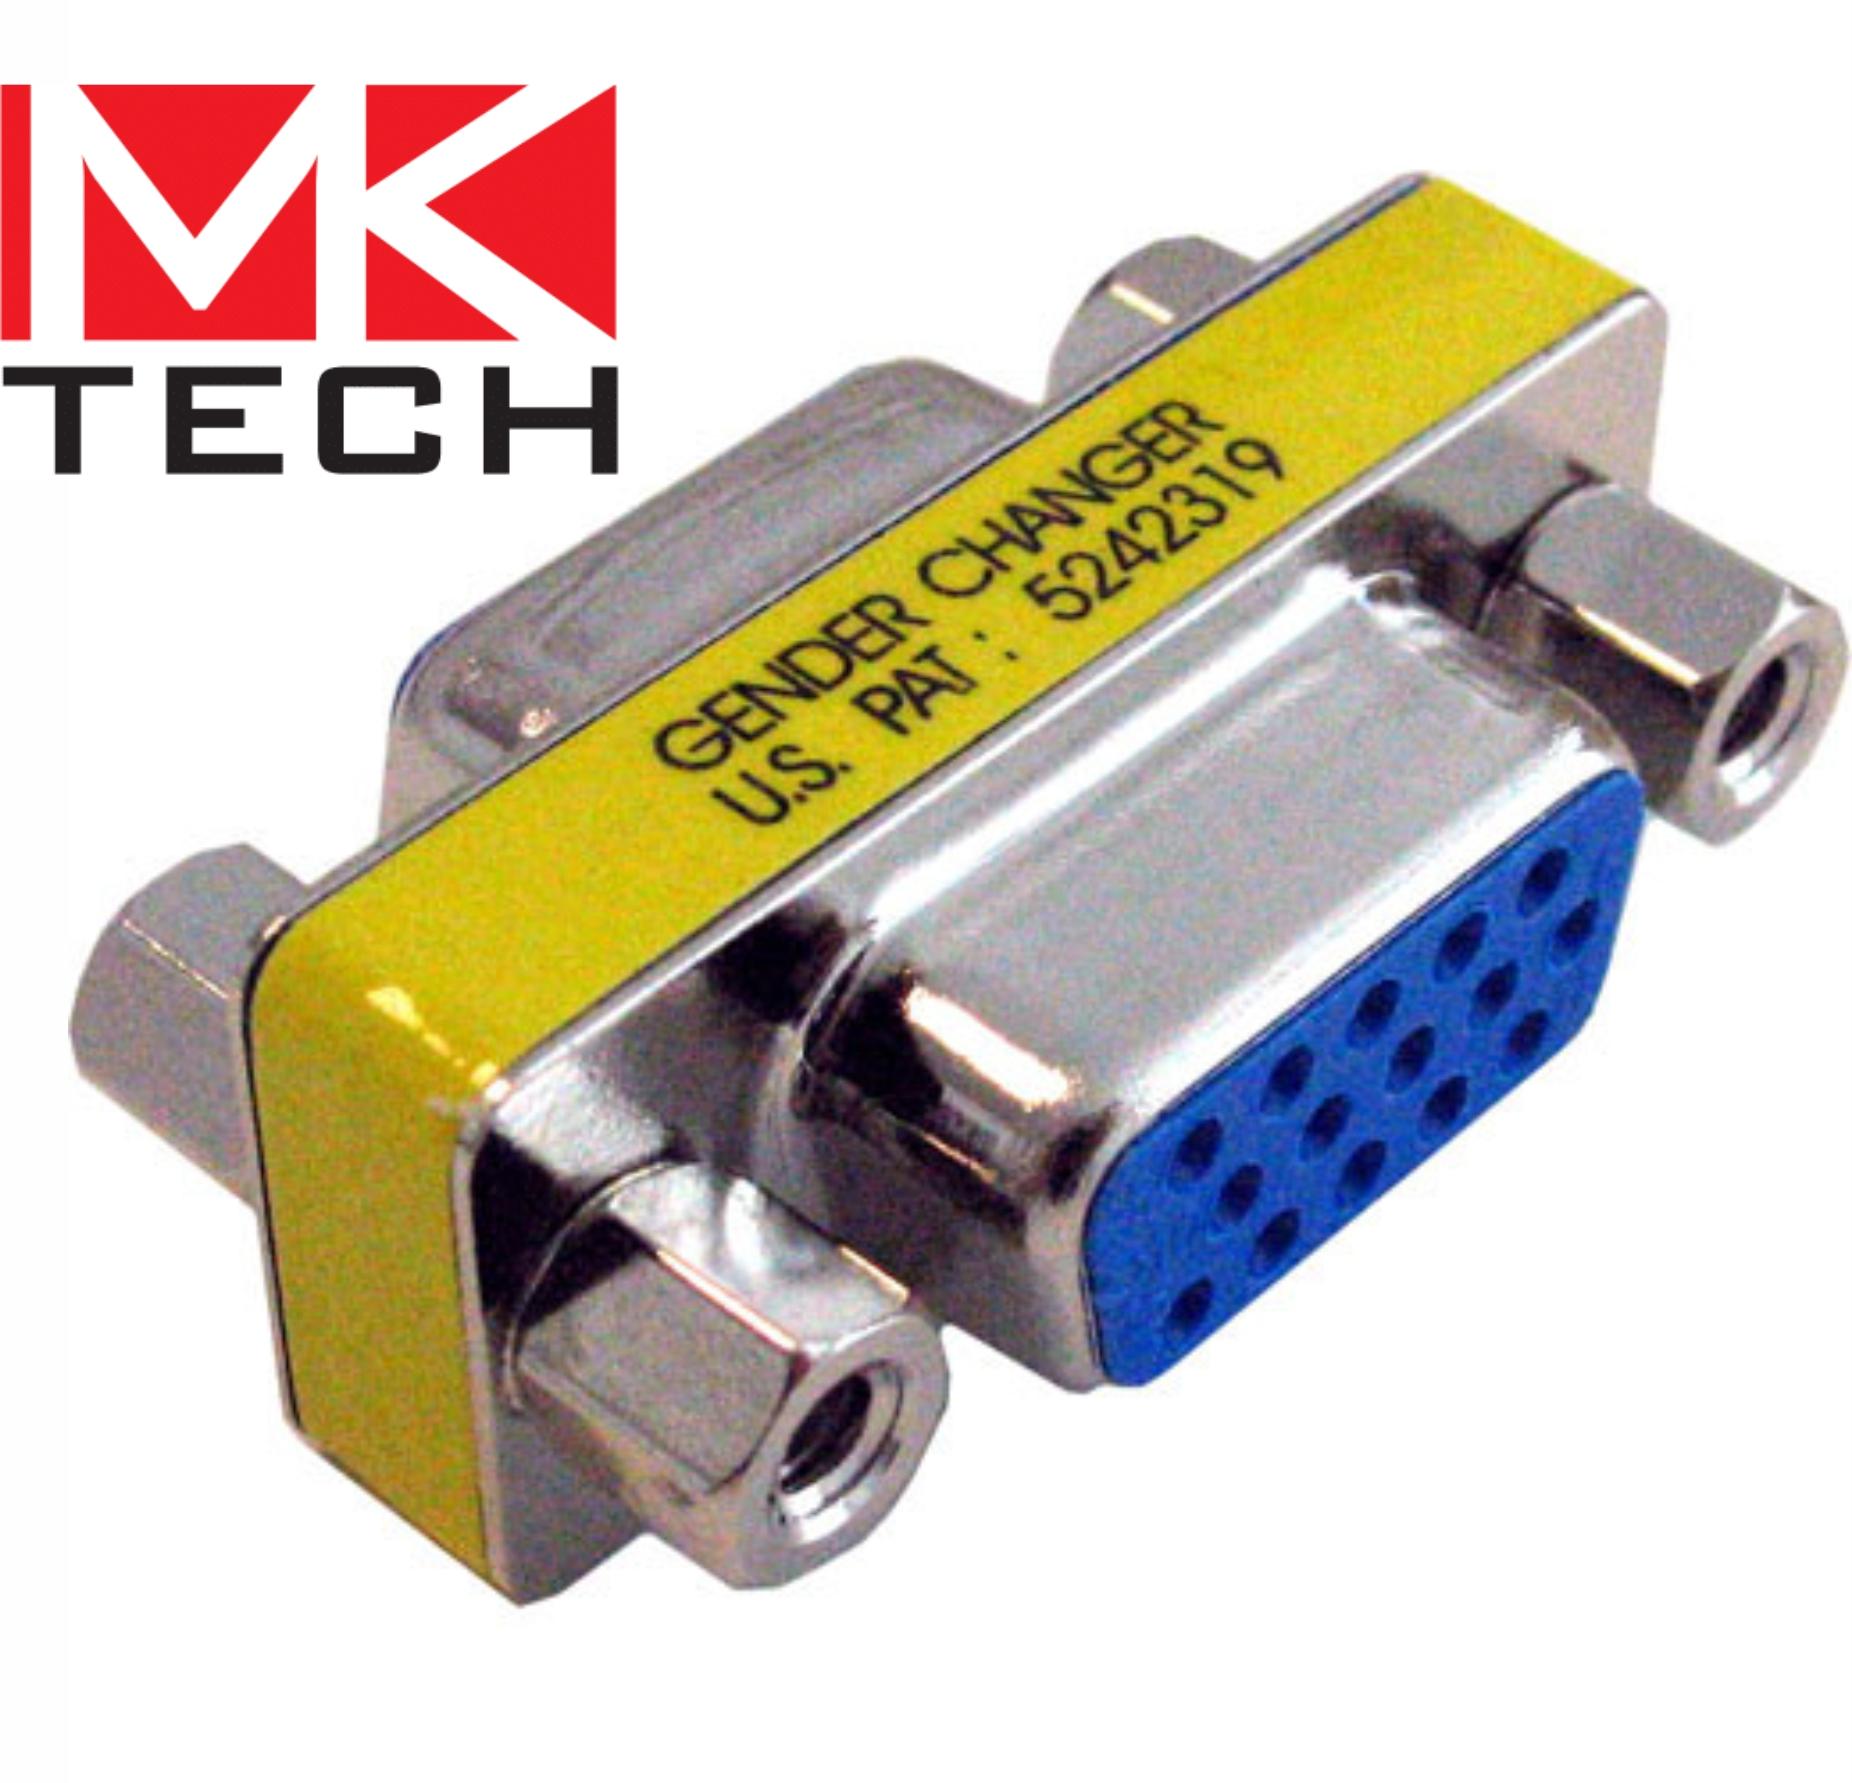 VGA HD15 Male to VGA HD15 Female MKTECH